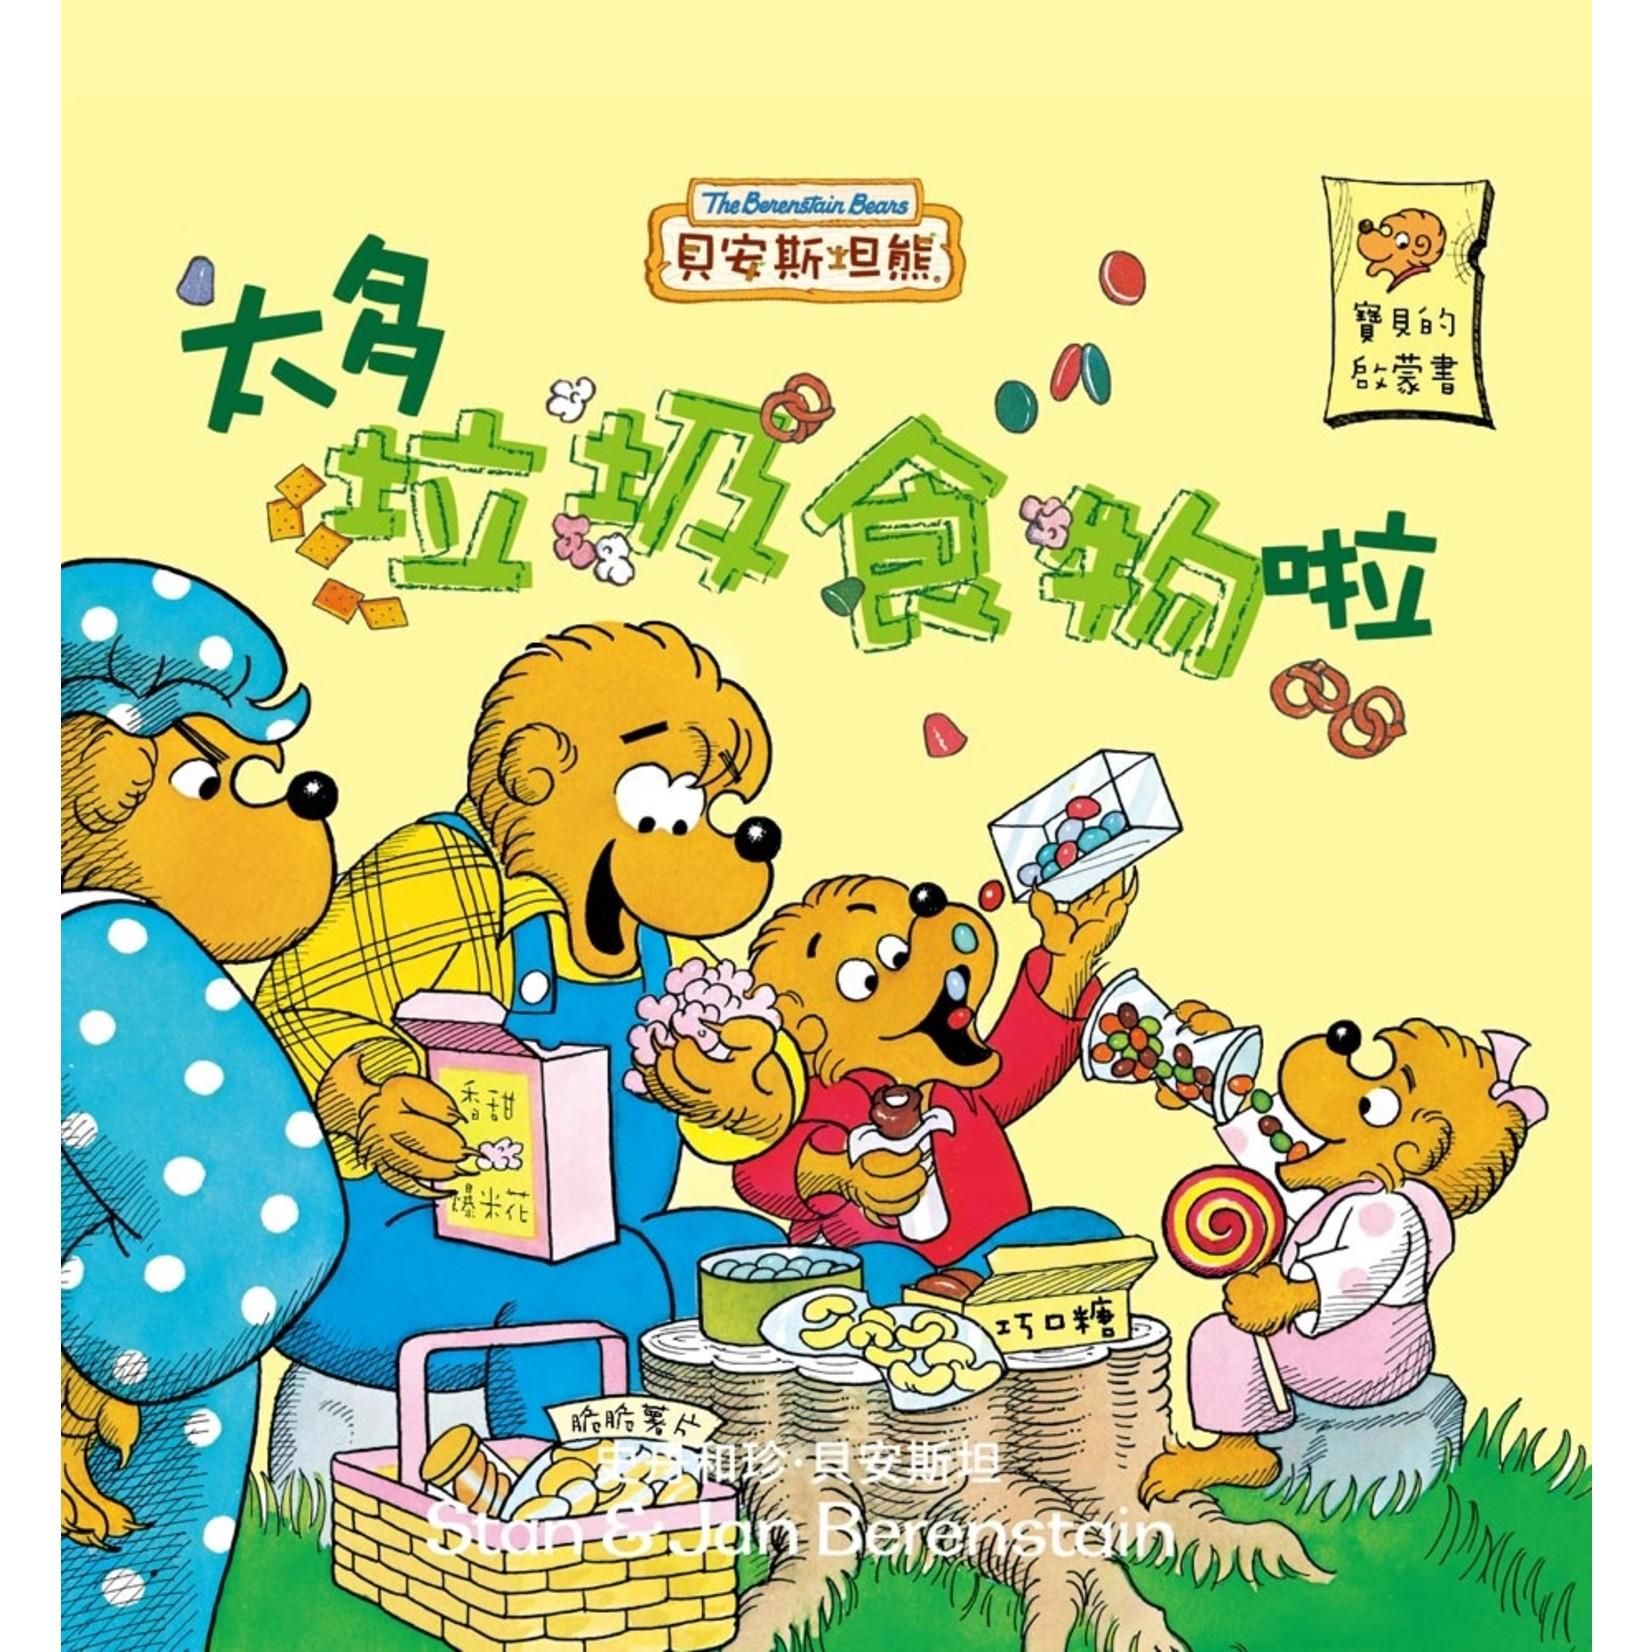 生命樹 Life Tree Global 貝安斯坦熊系列01:太多垃圾食物啦 The Berenstain Bears 01: Too Much Junk Food